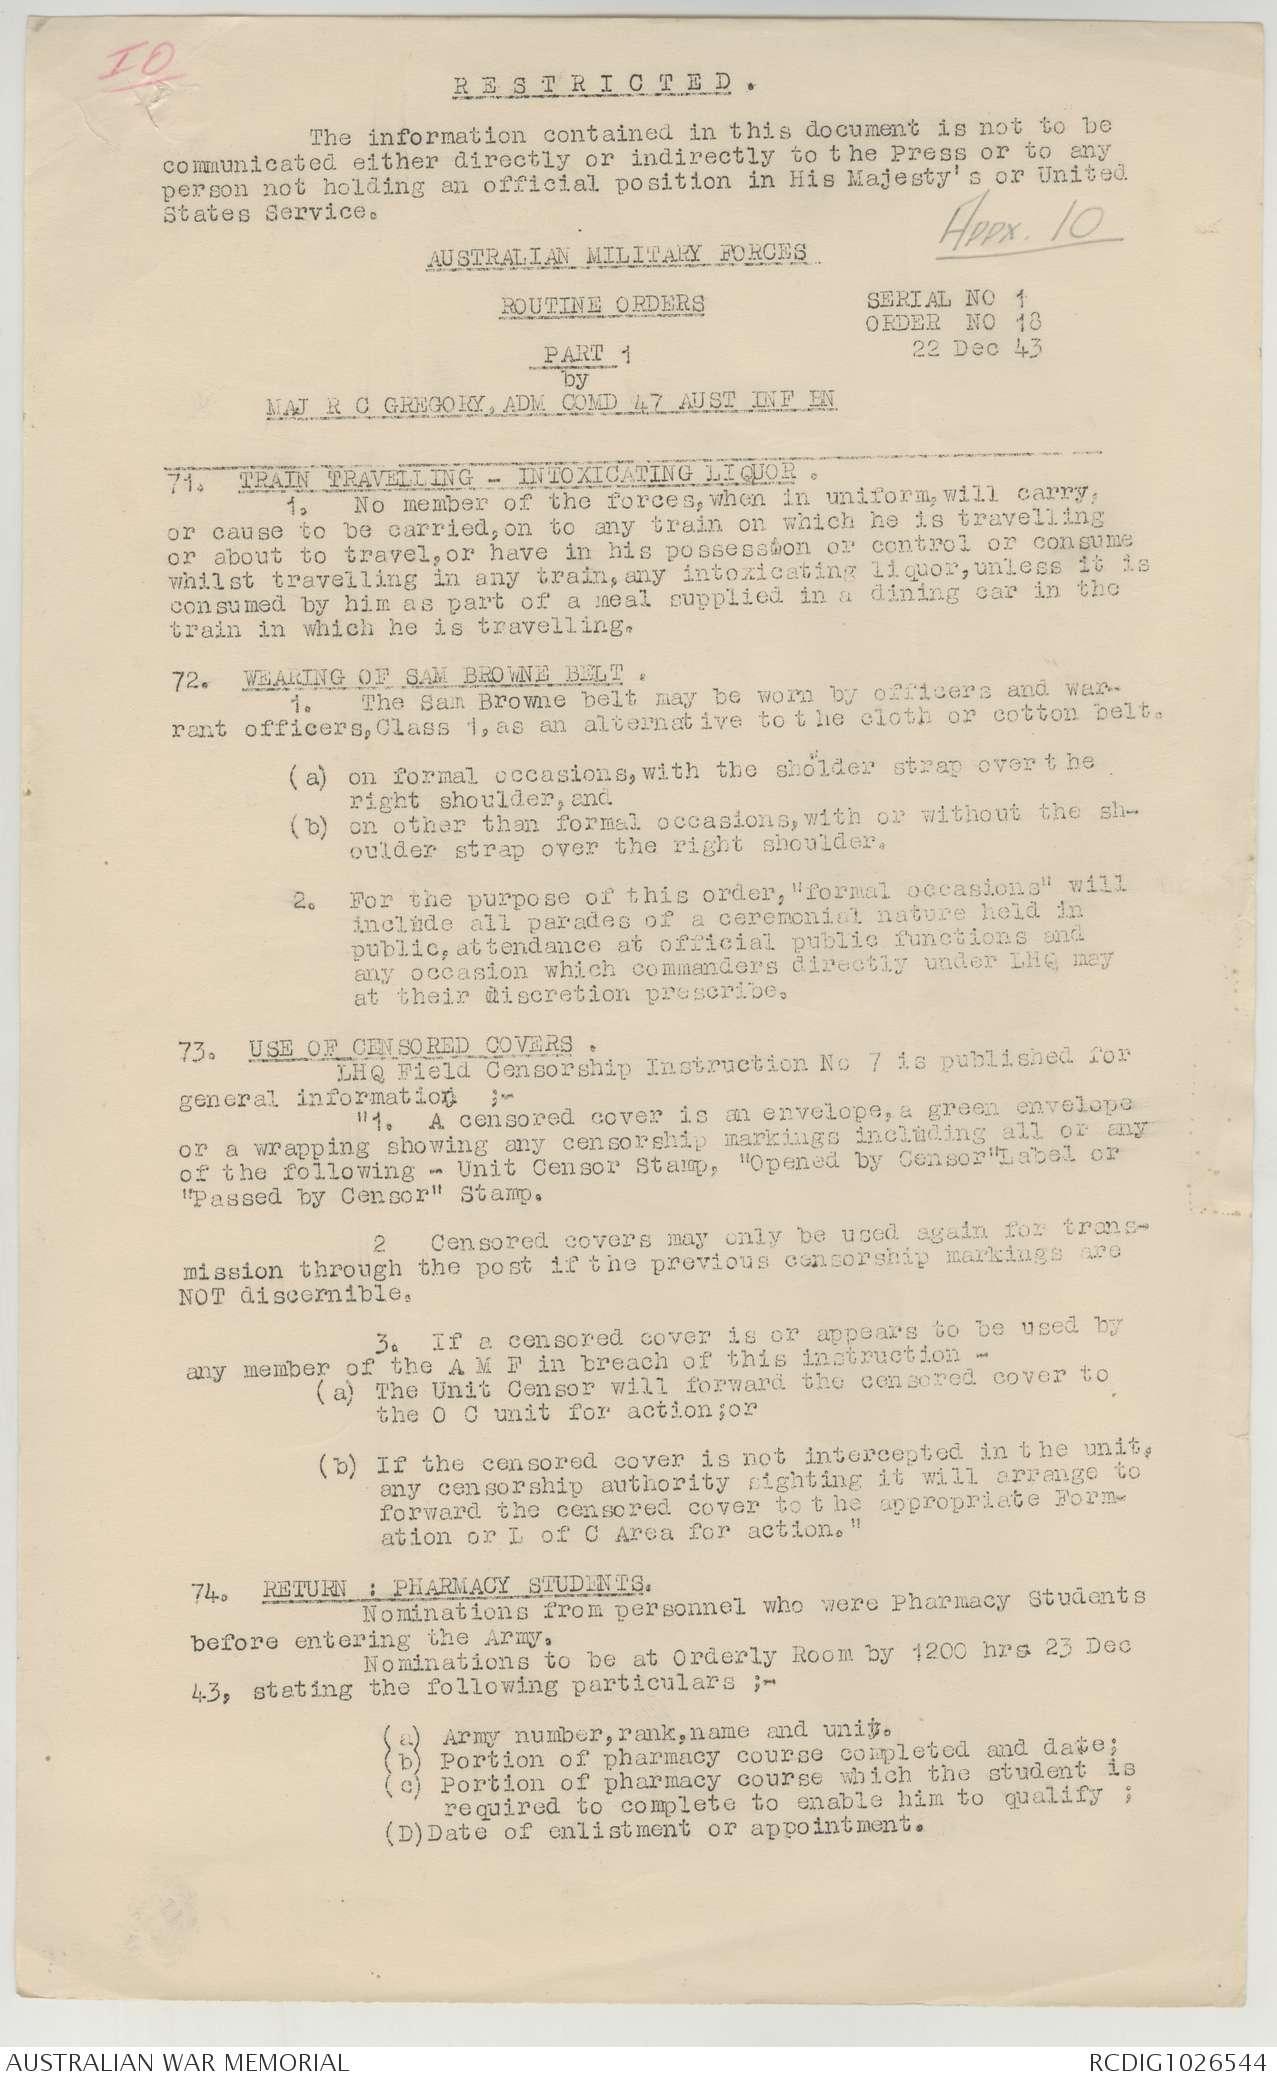 AWM52 8/3/86/11 - December 1943 | The Australian War Memorial